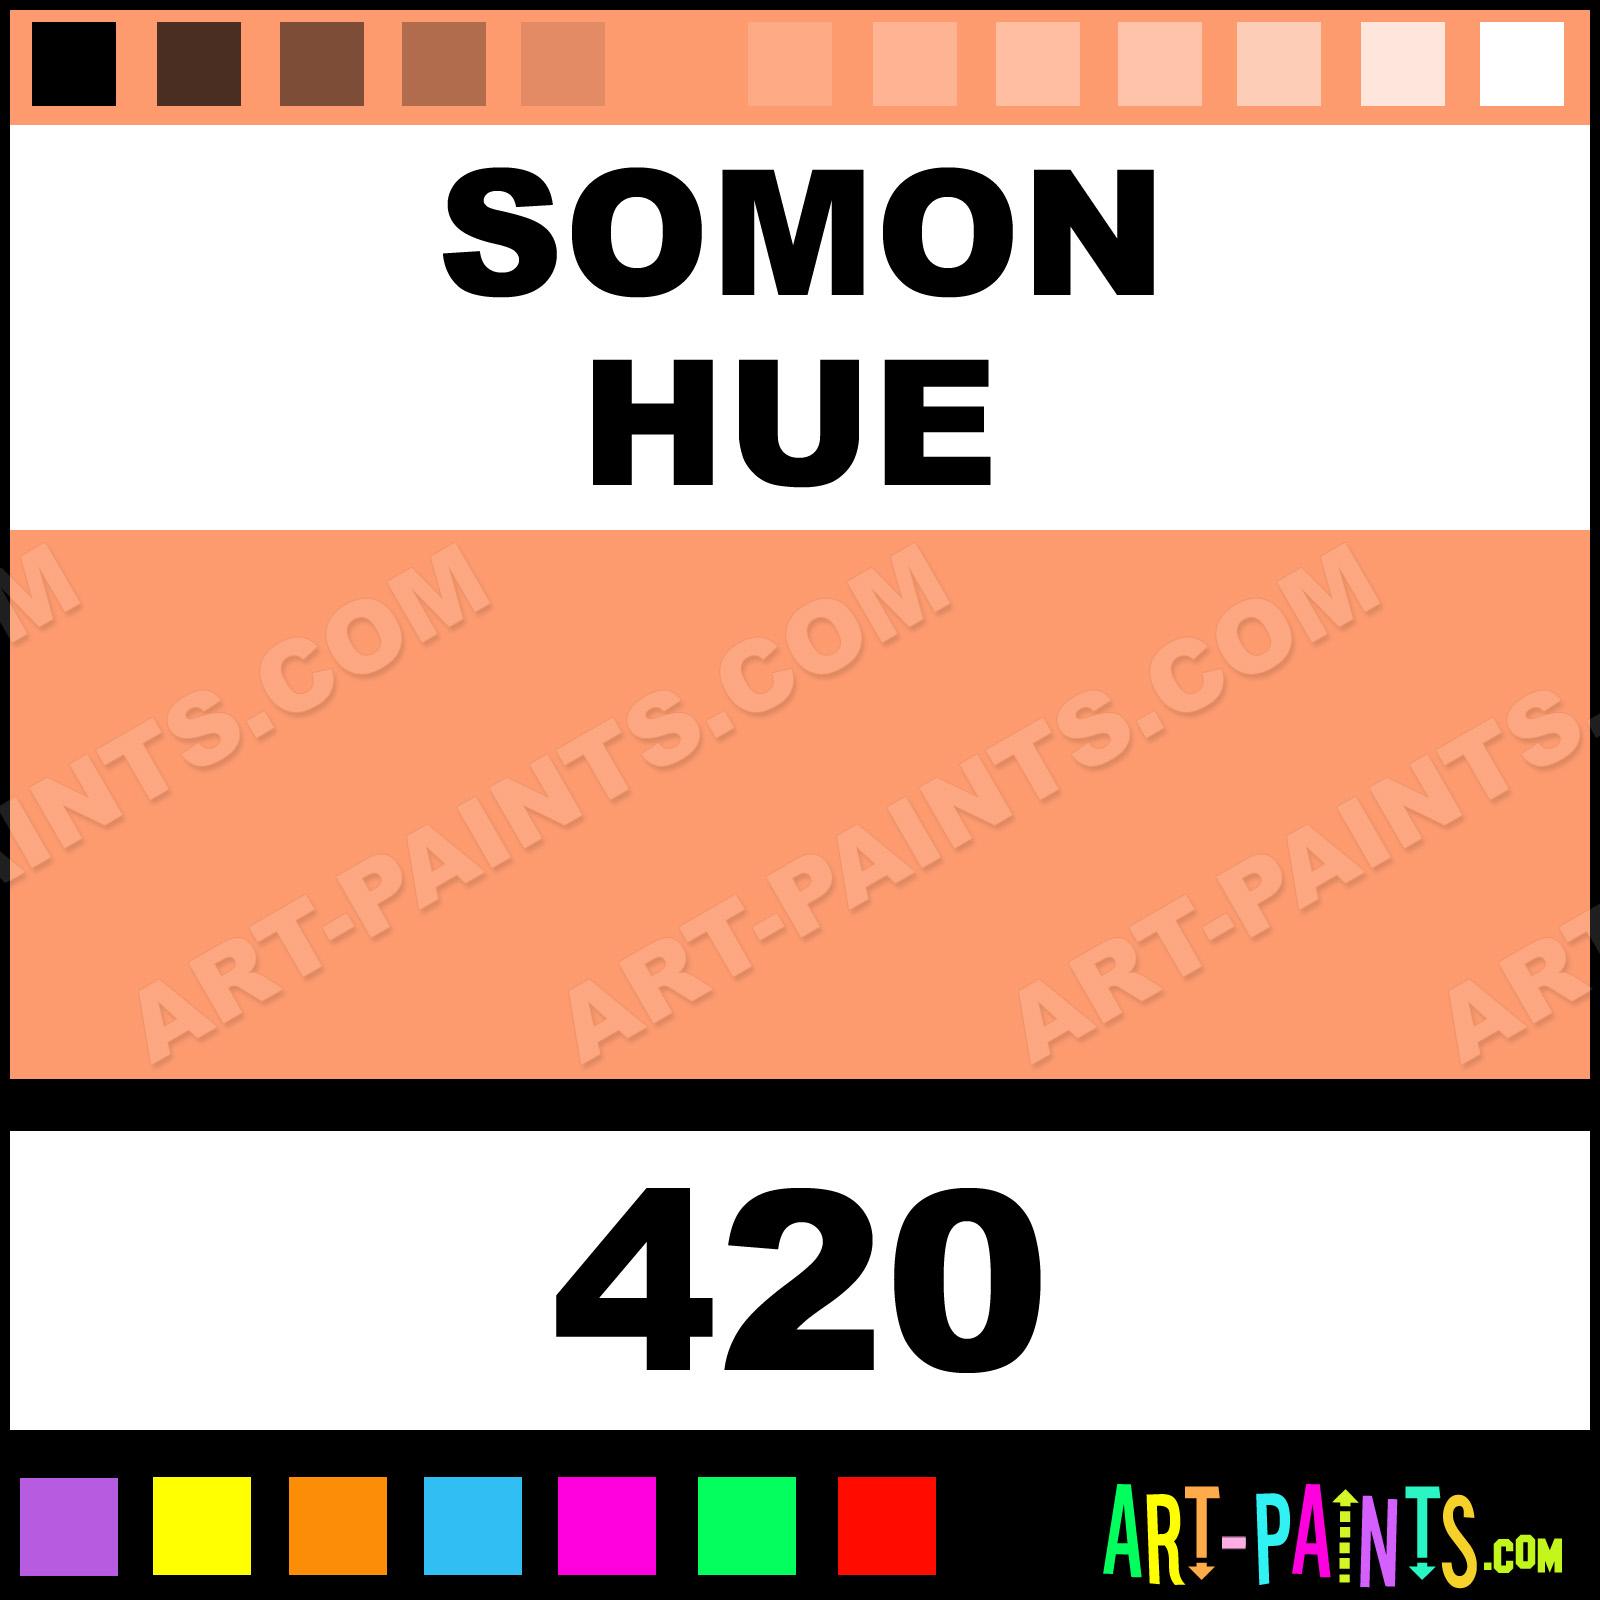 сомон цвет фото